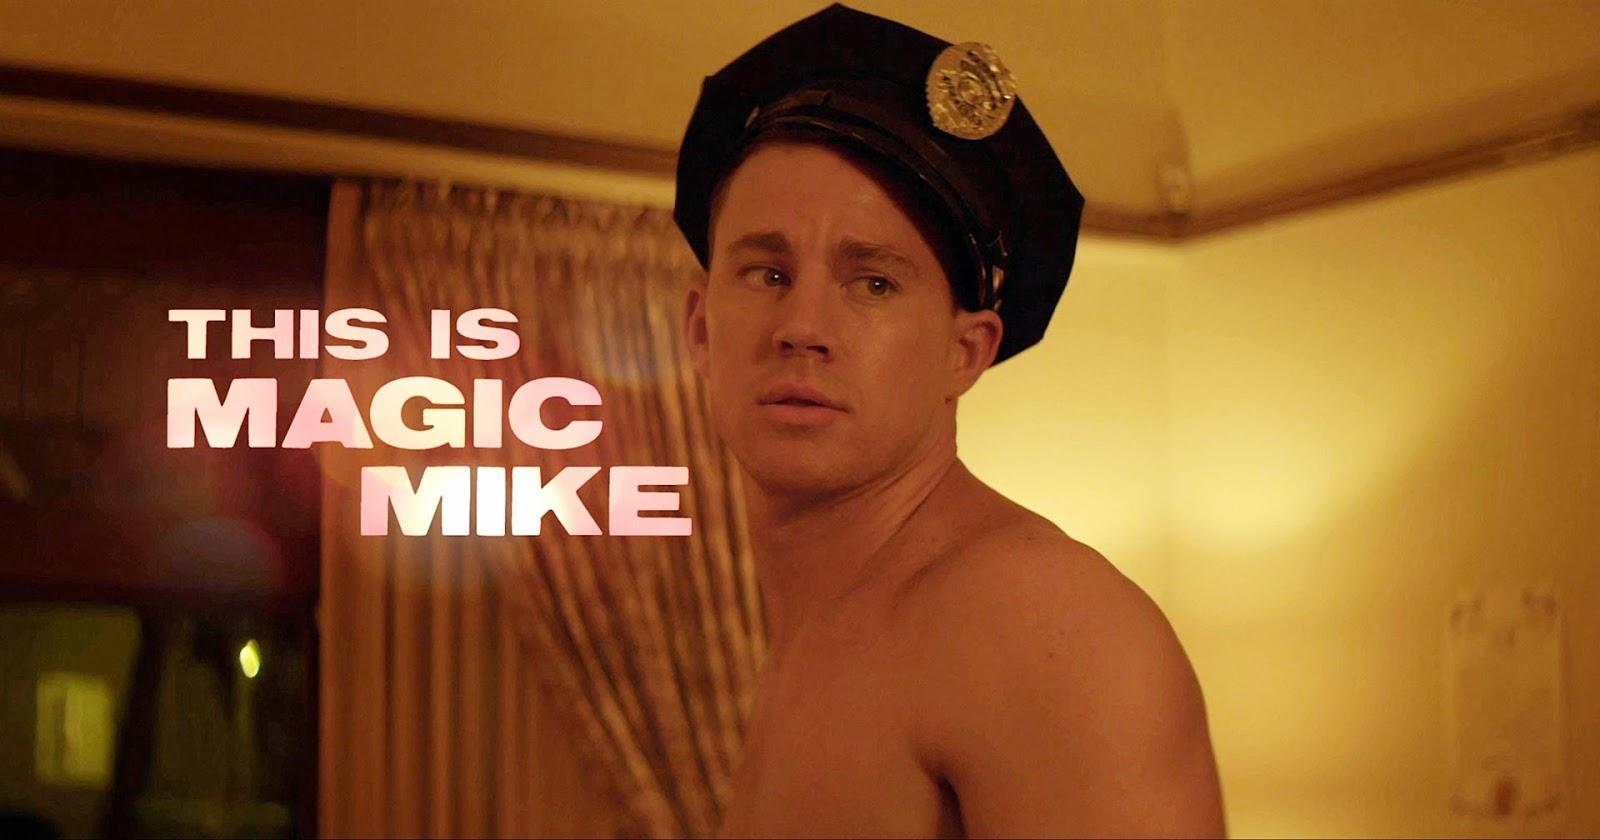 Channing Tatum Magic Mike A Blog Next Doo...